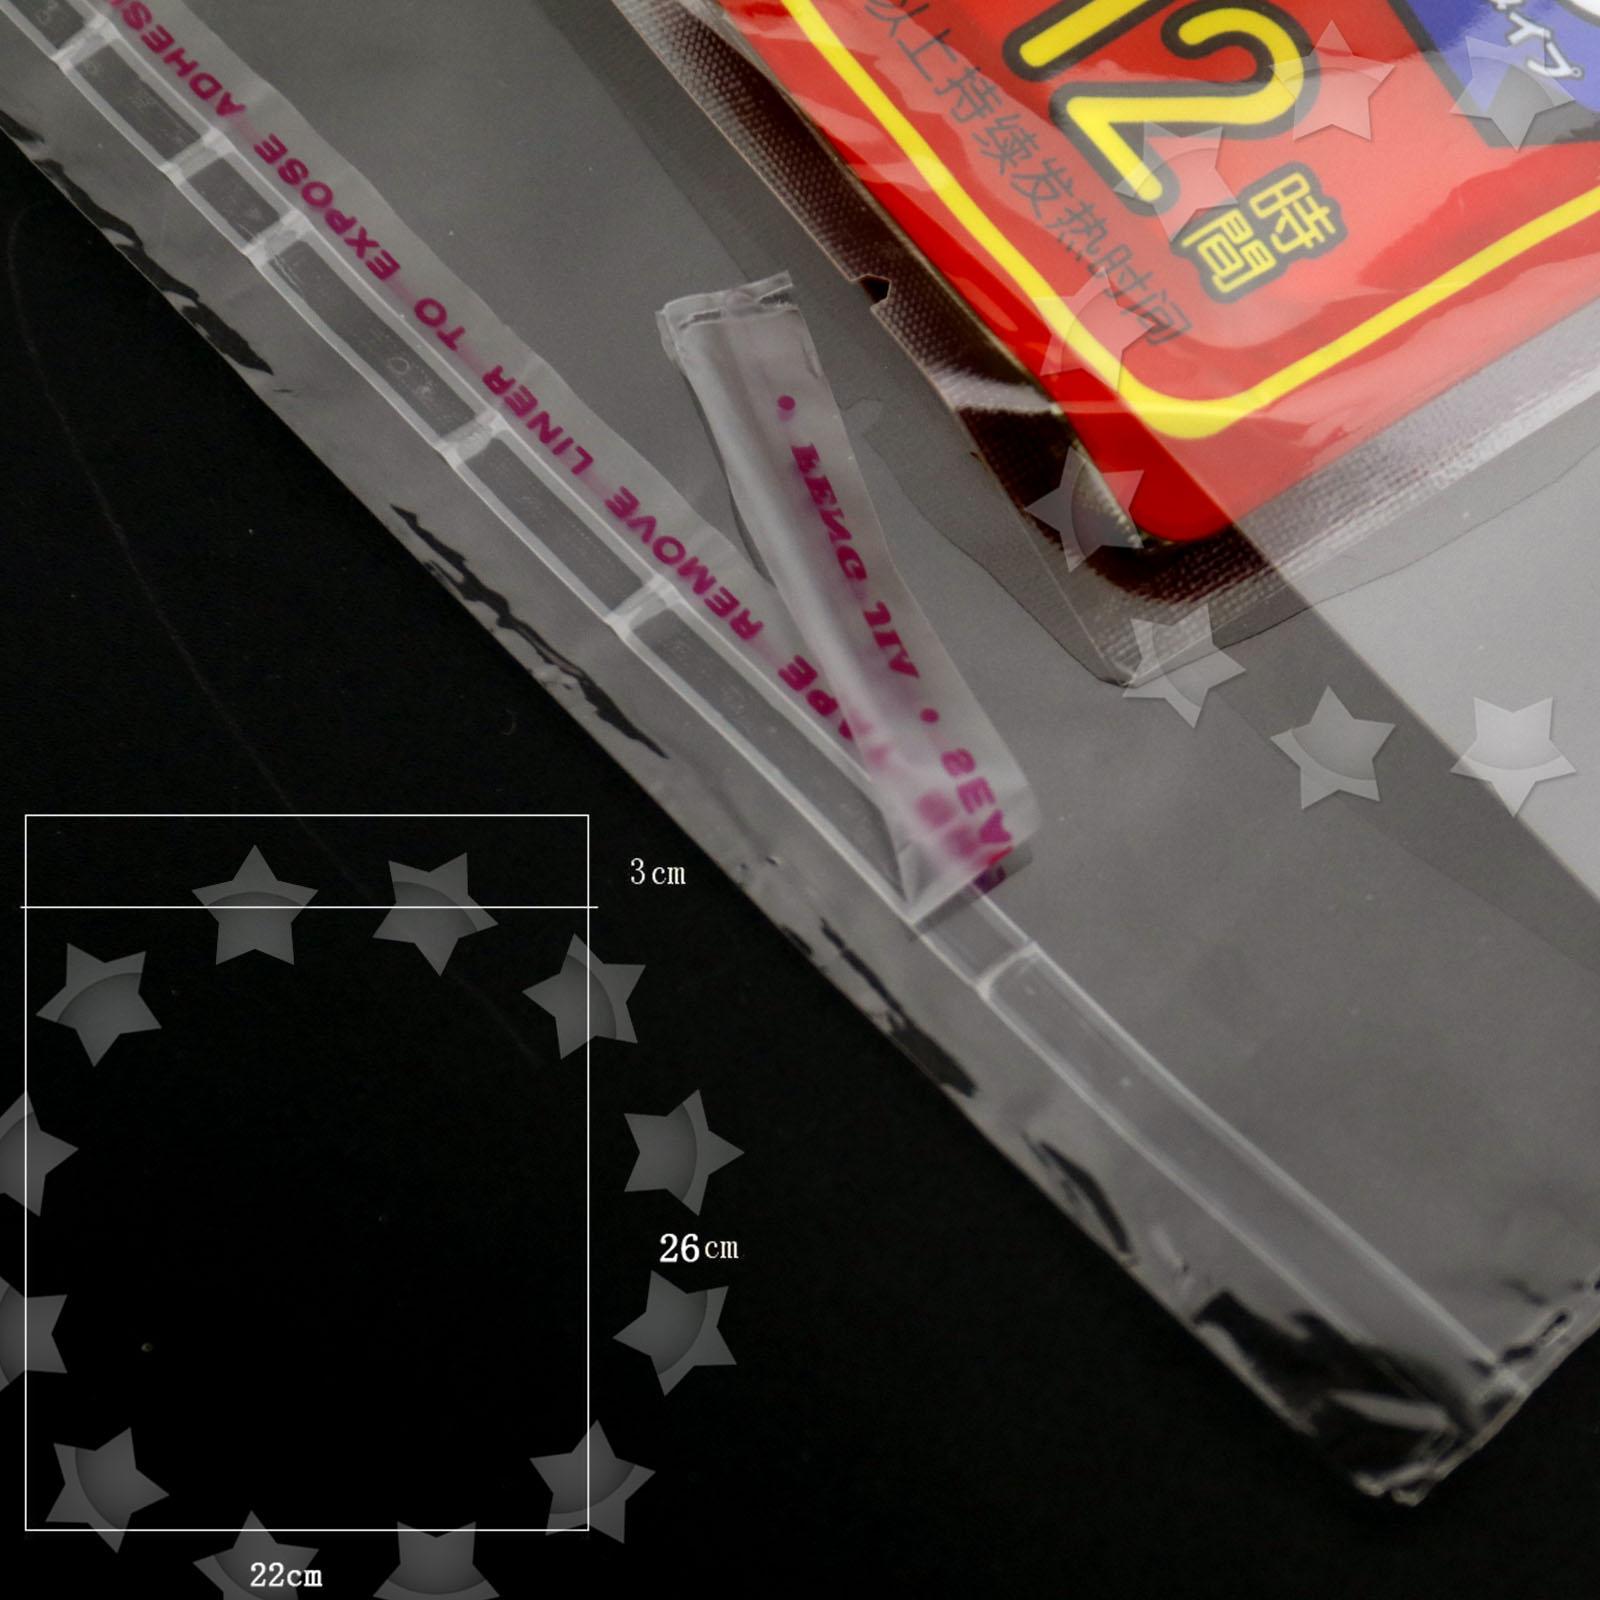 100 Pcs 2 Sizes Cello Card Bags Cellophone Self Seal Strip Crystal